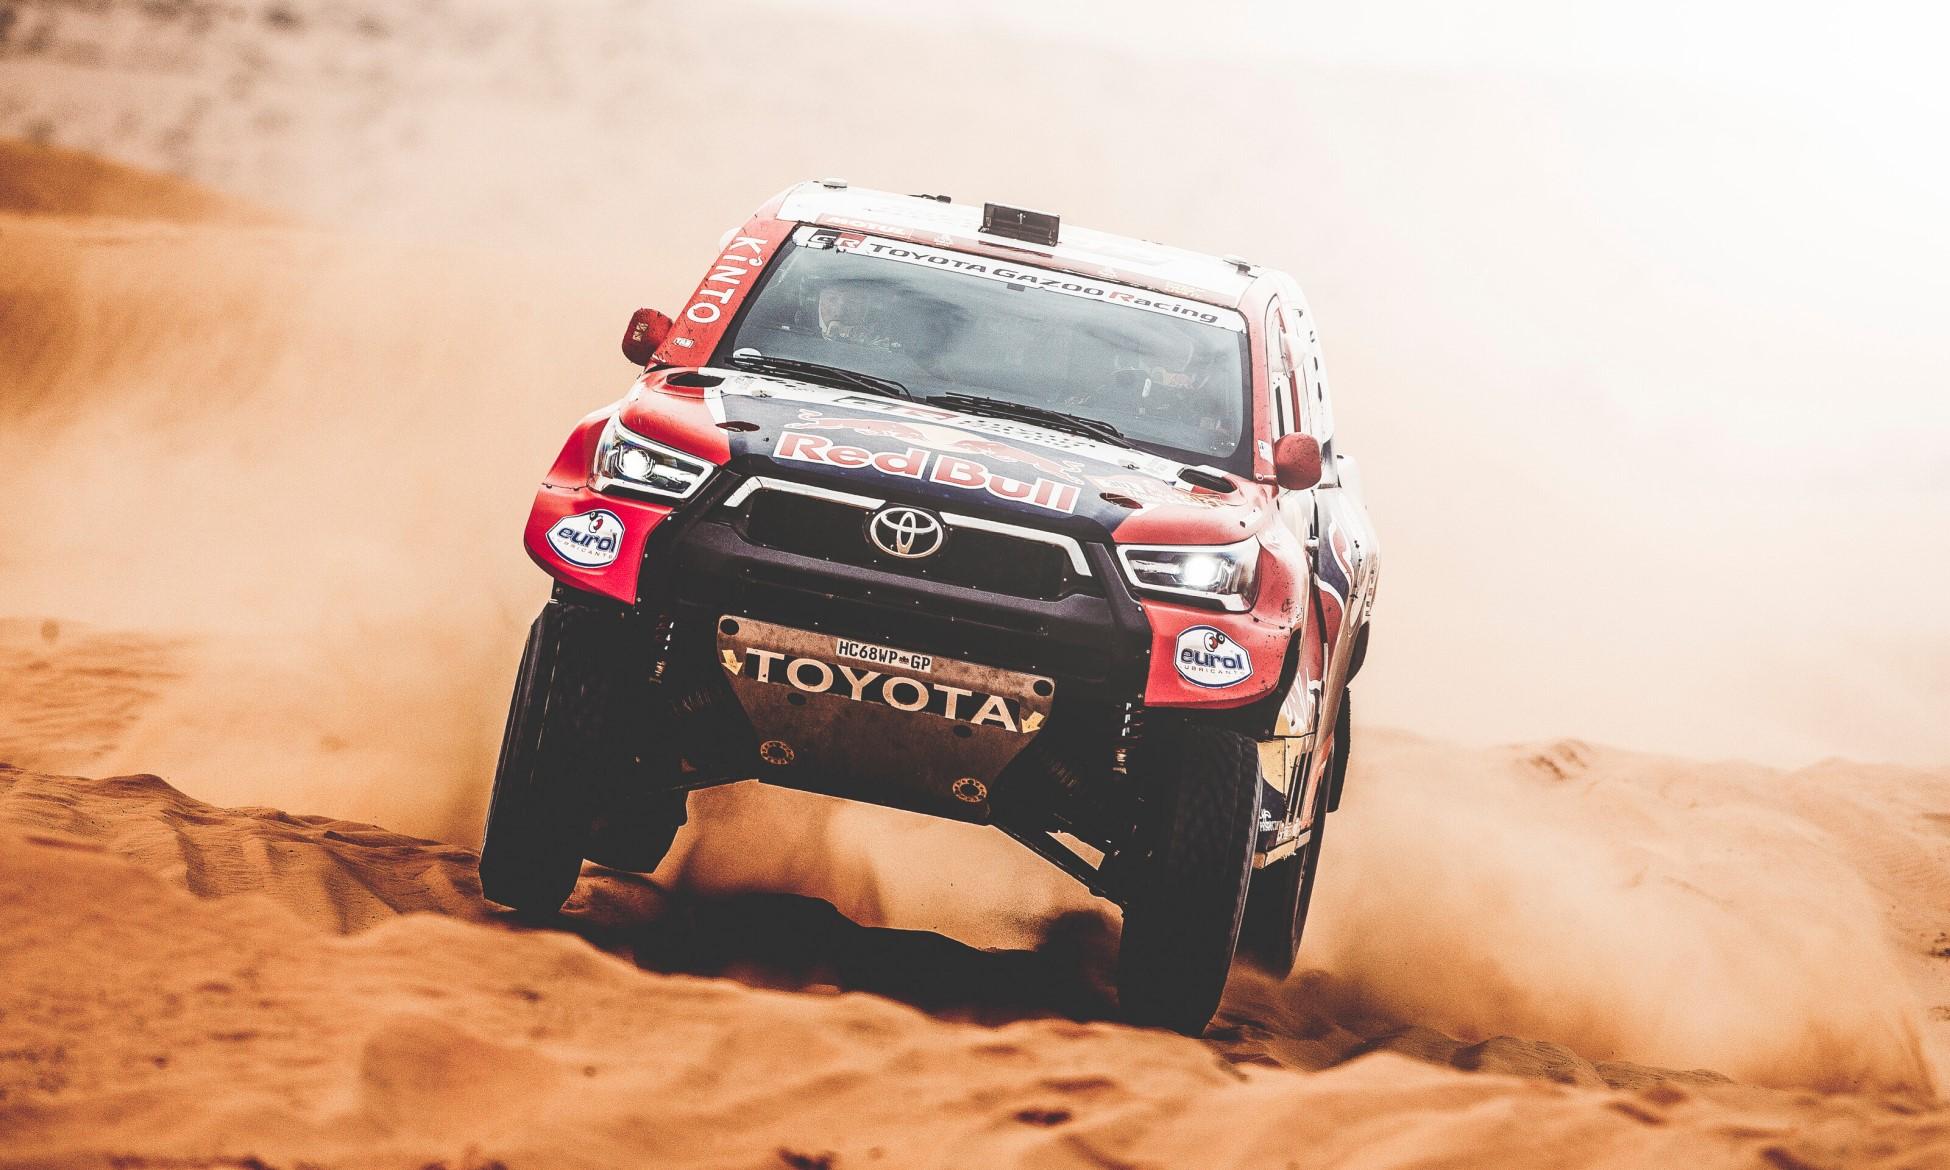 Nasser Al-Attiyah lost time on 2021 Dakar Stage 7